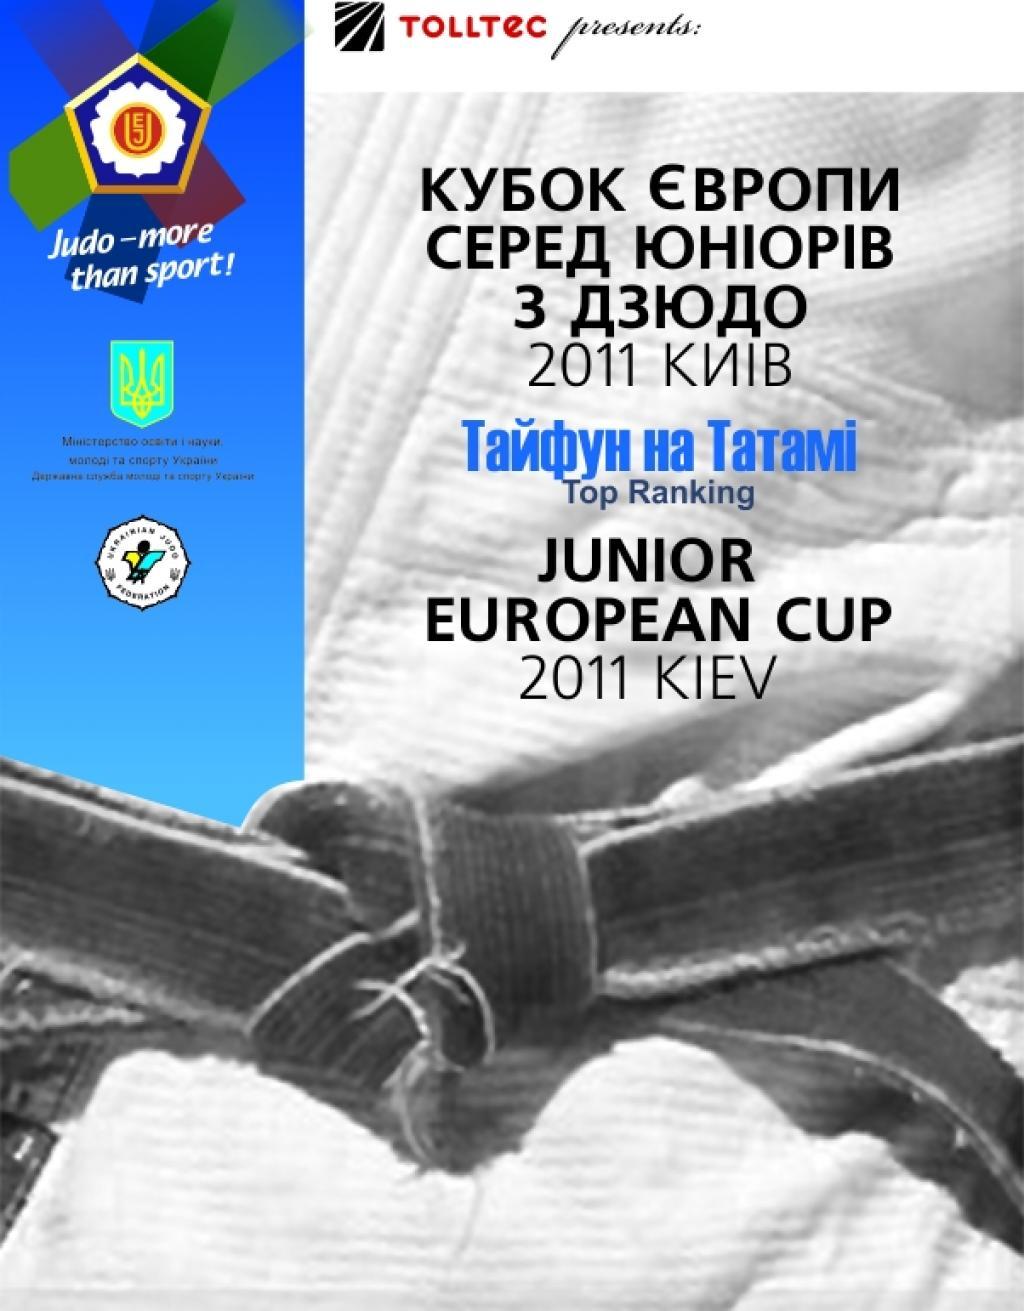 Kiev ready for European Junior Cup